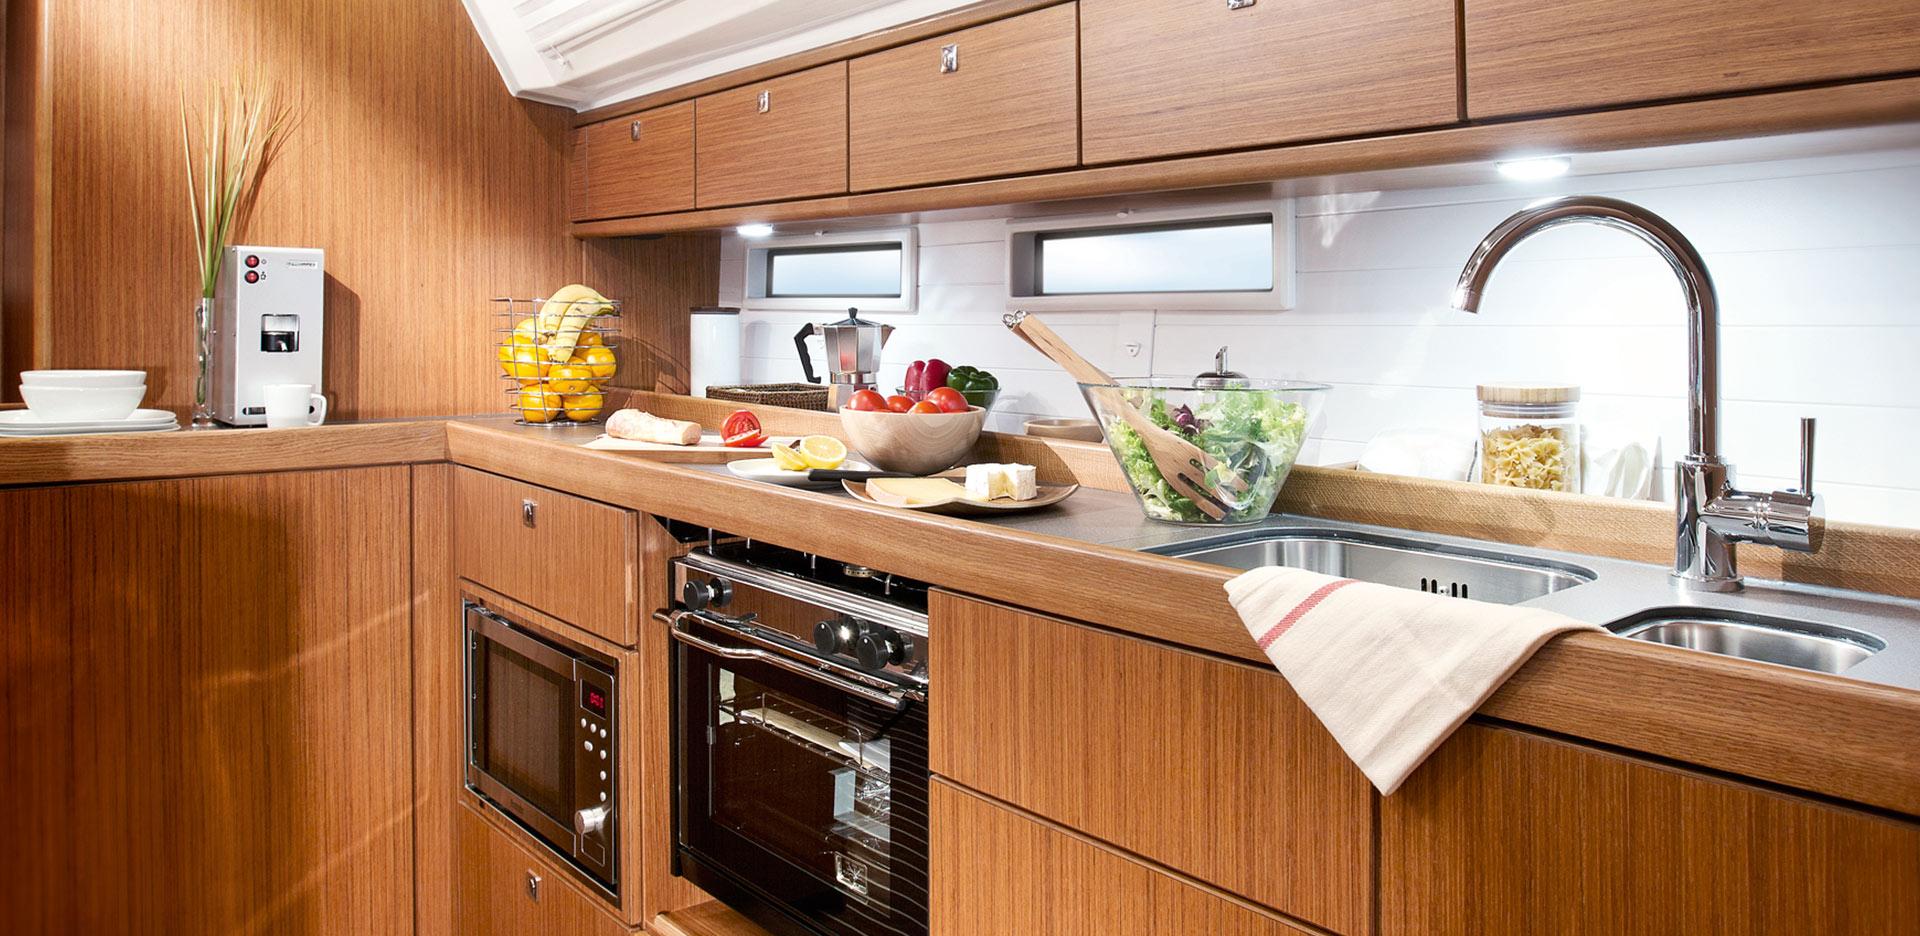 Livig-room-Inchiriere-Petreceri-Croaziere-Vacante-Yacht-Bavaria-Cruise46_3